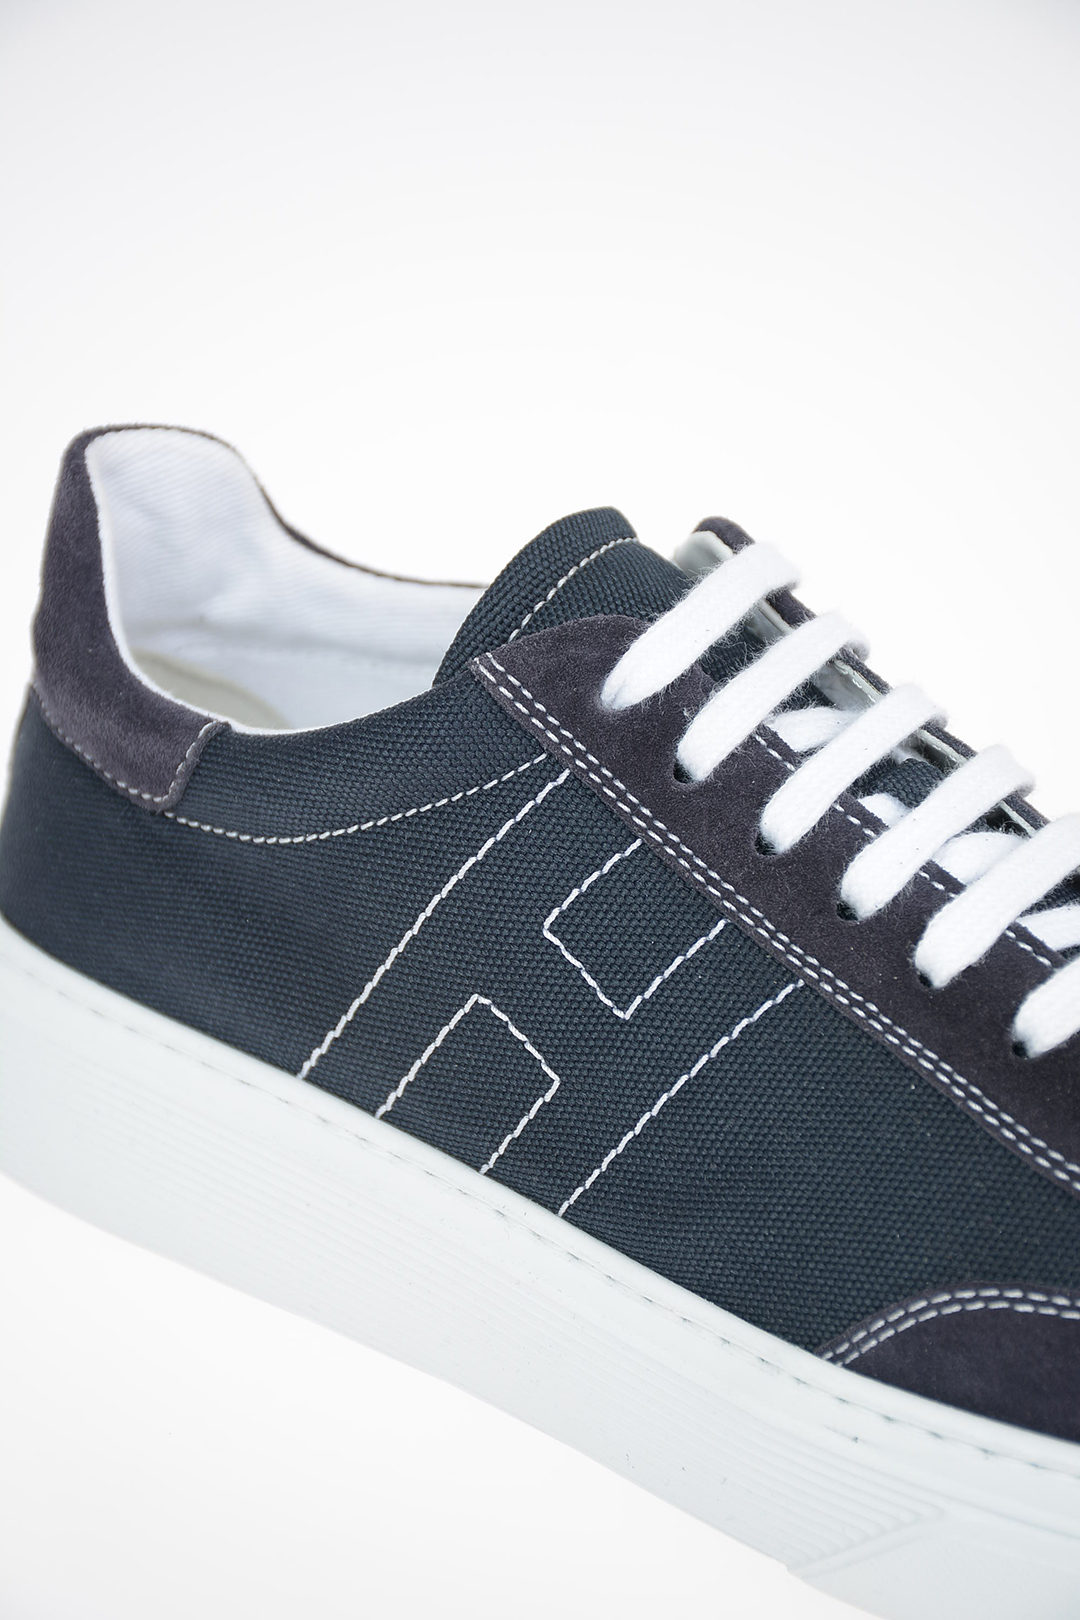 JUNIOR Denim R365 Sneakers With Suede Details